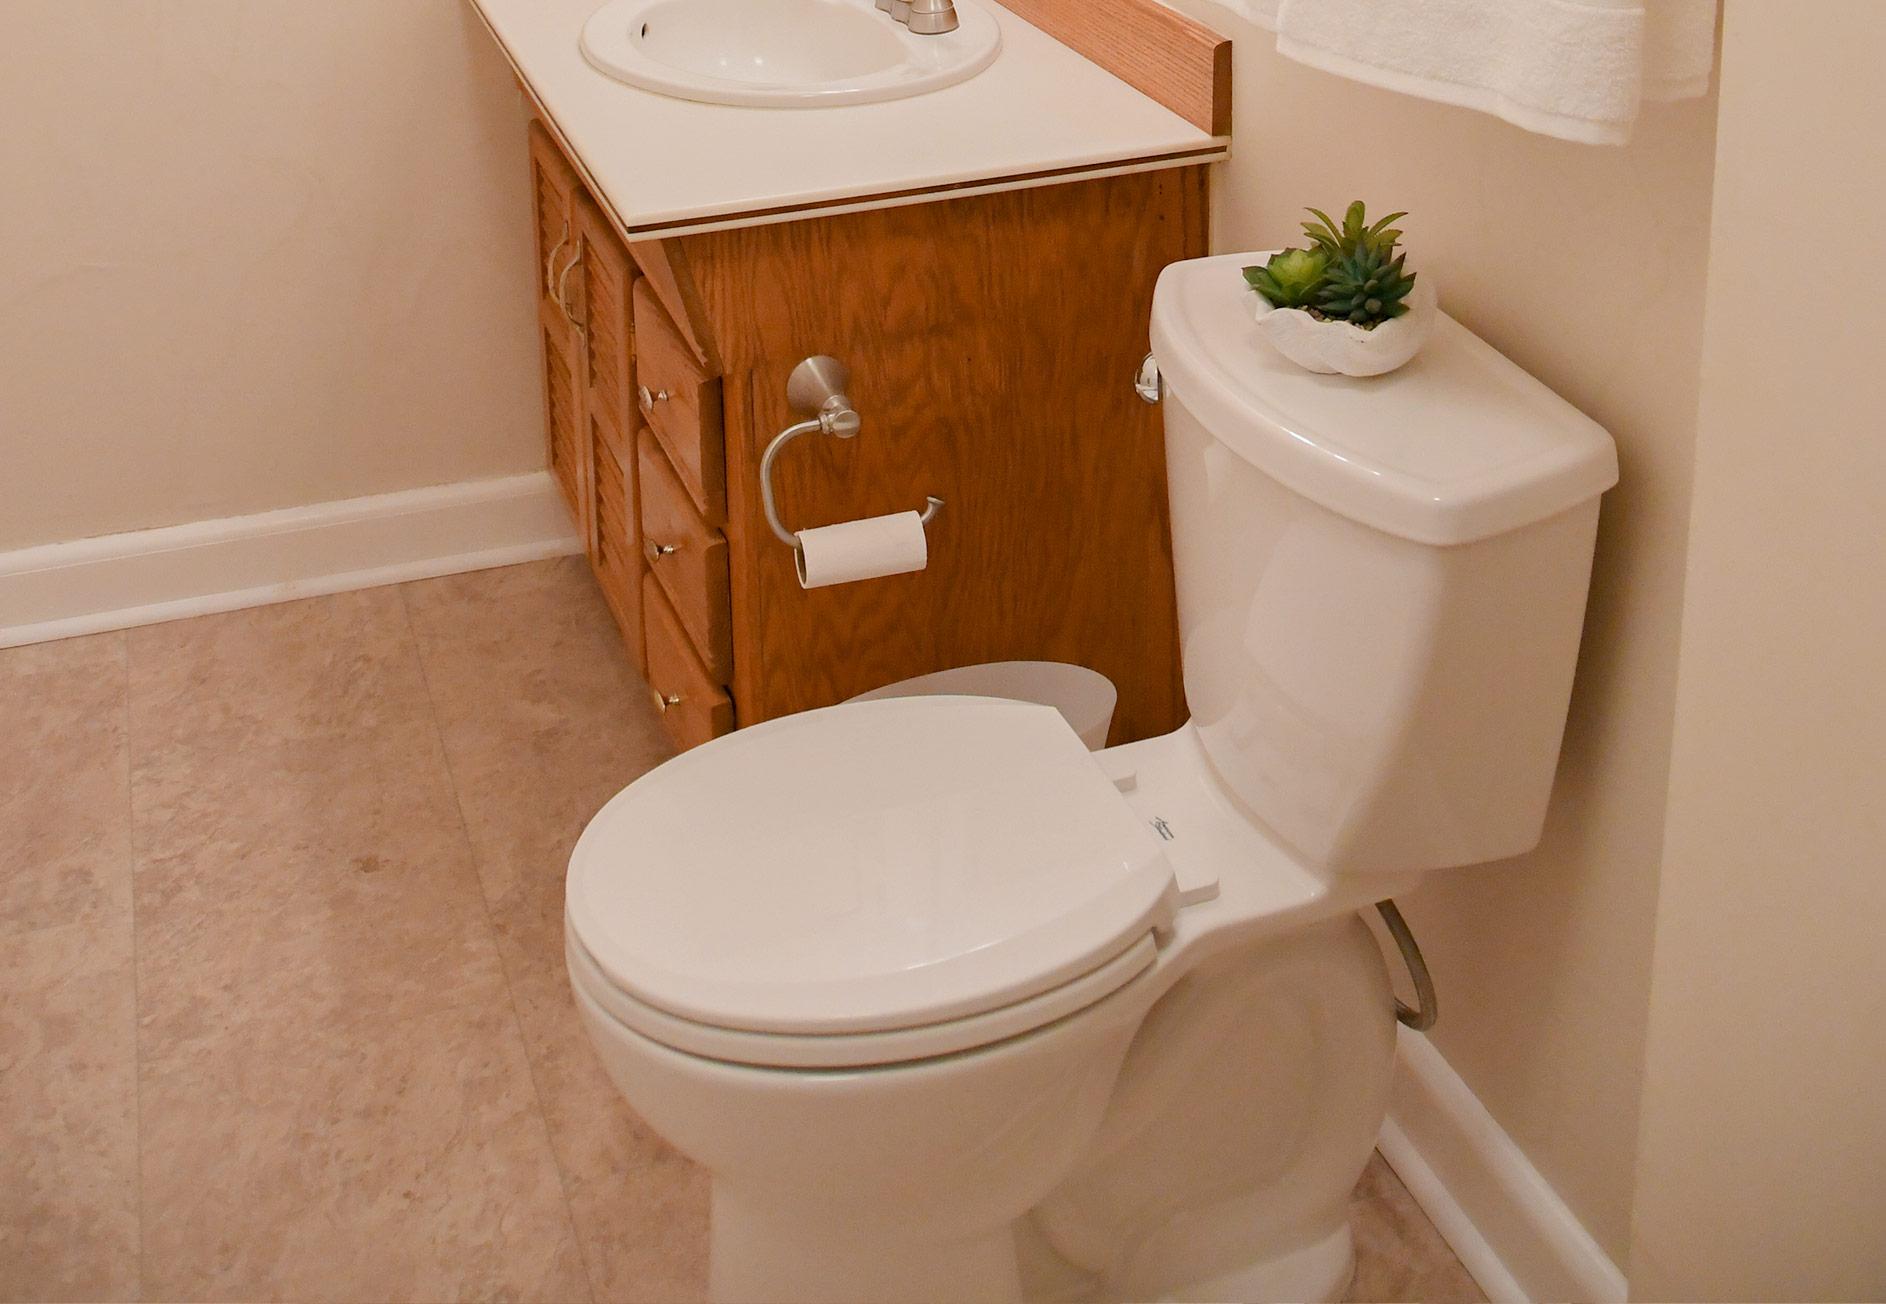 Lake City Rental - Bathroom